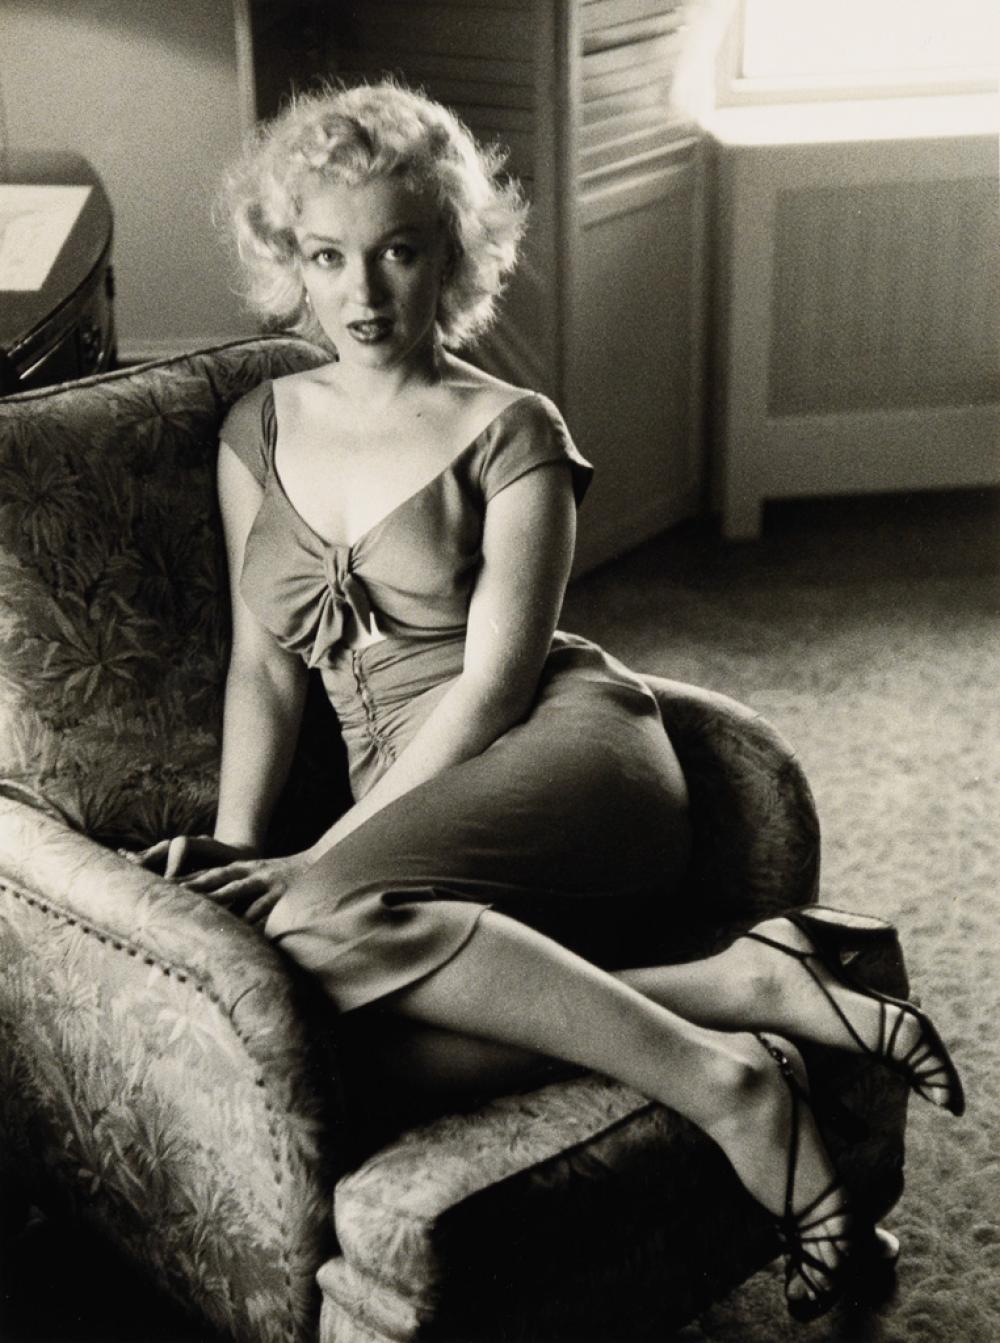 BEN ROSS (1916-2004) Marilyn Monroe, Atlantic City, New Jersey.